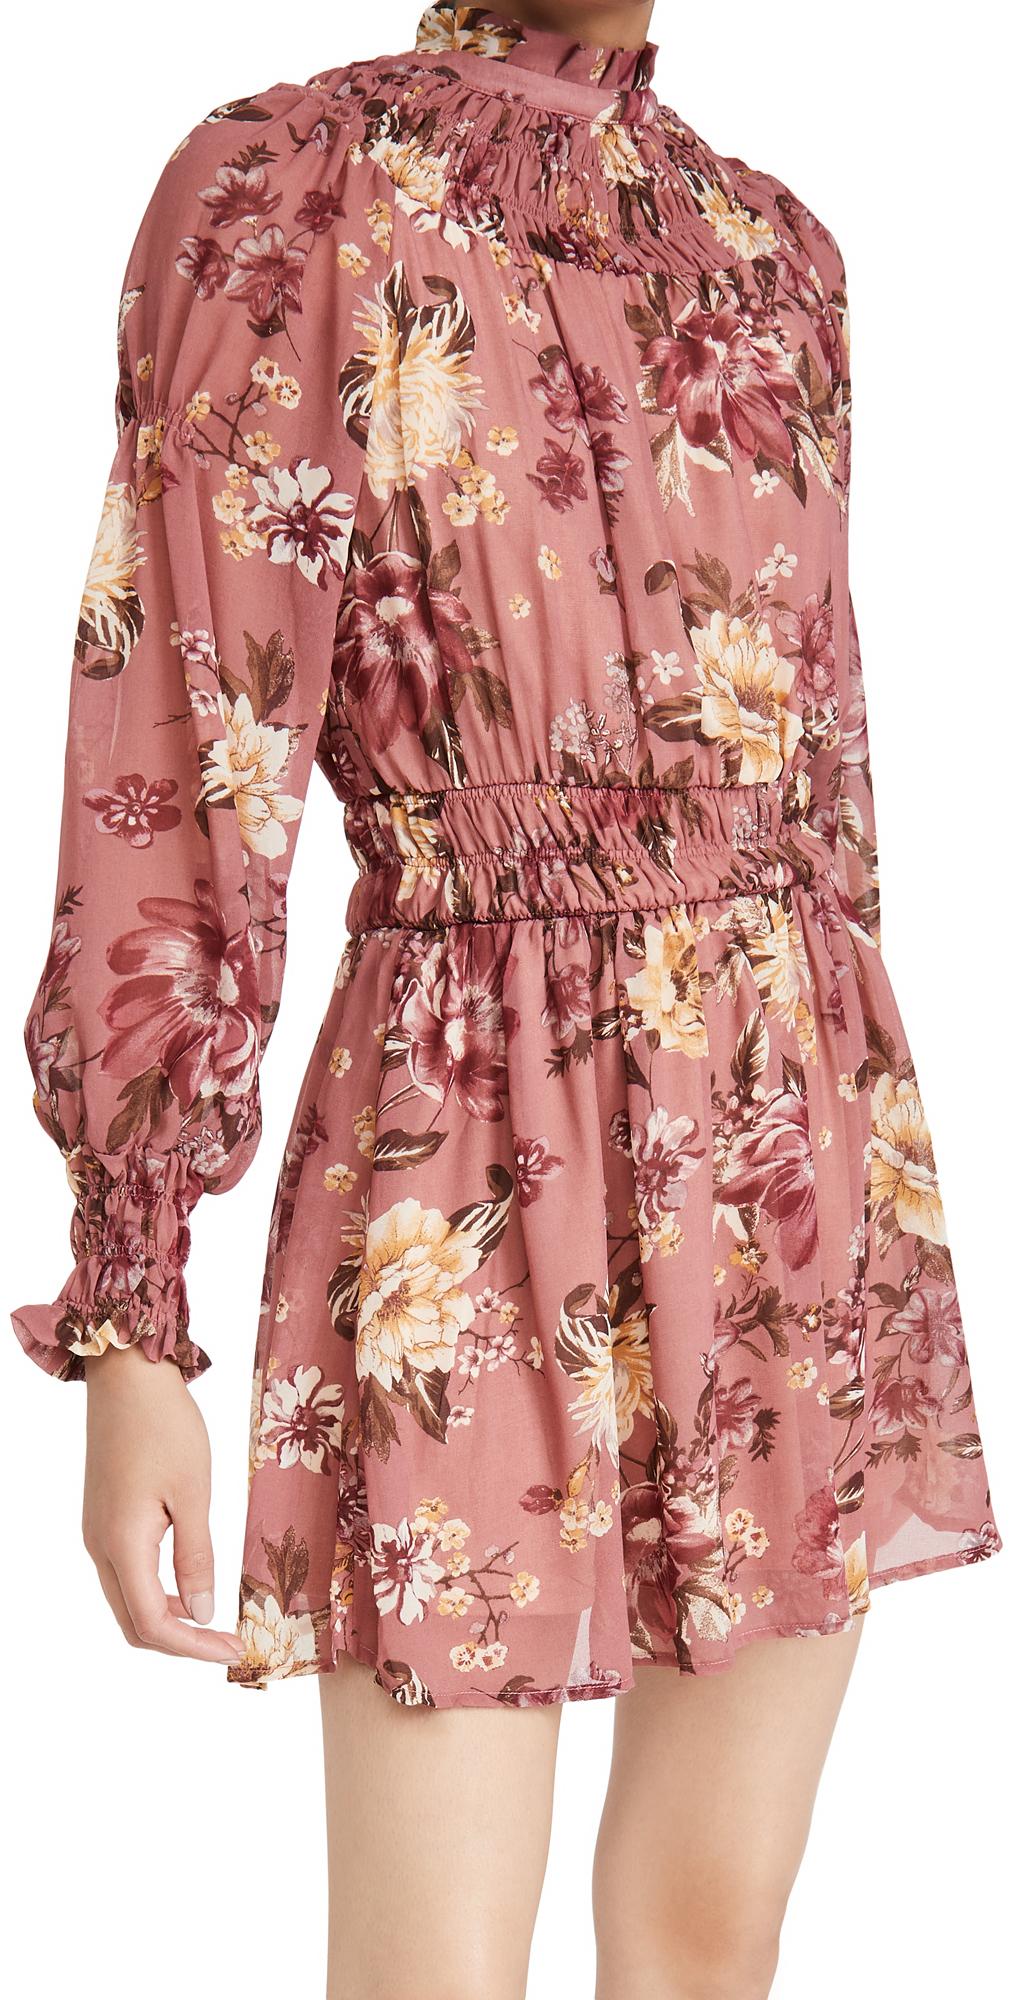 En Saison Floral Print Mini Dress With Long Sleeves